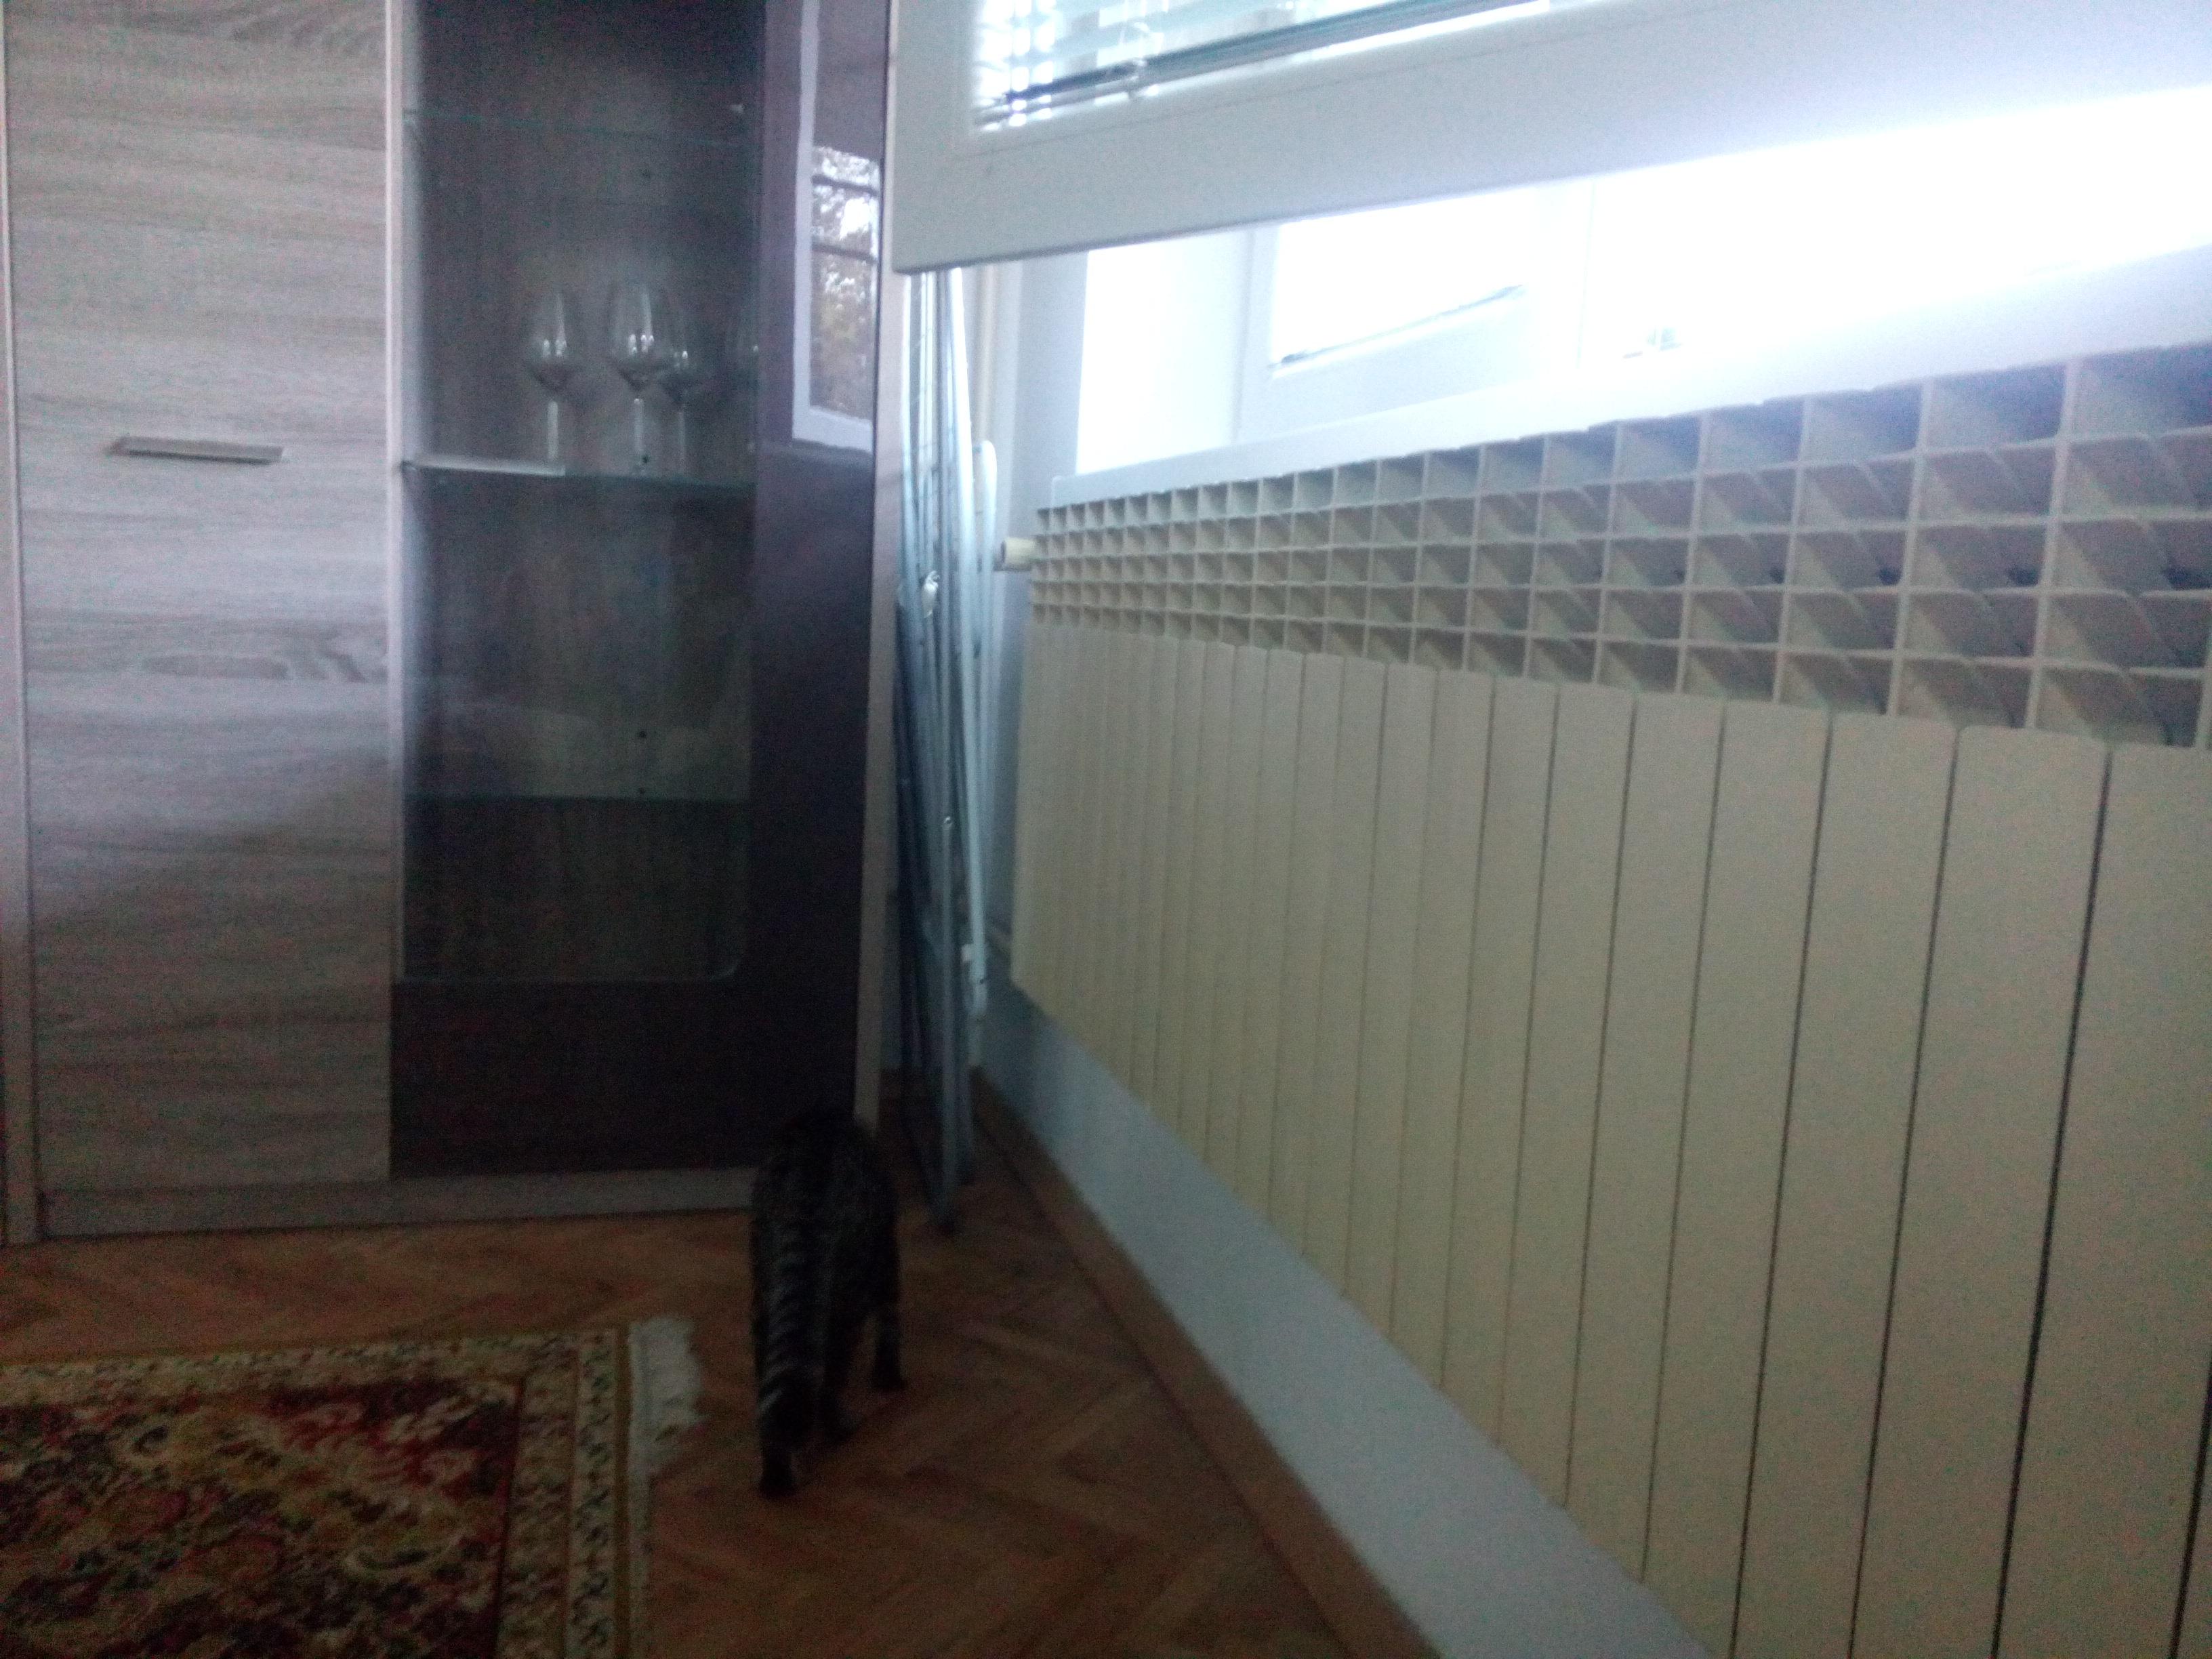 https://i.amy.gy/2017-sarajevo/IMG_20171005_172901.jpg